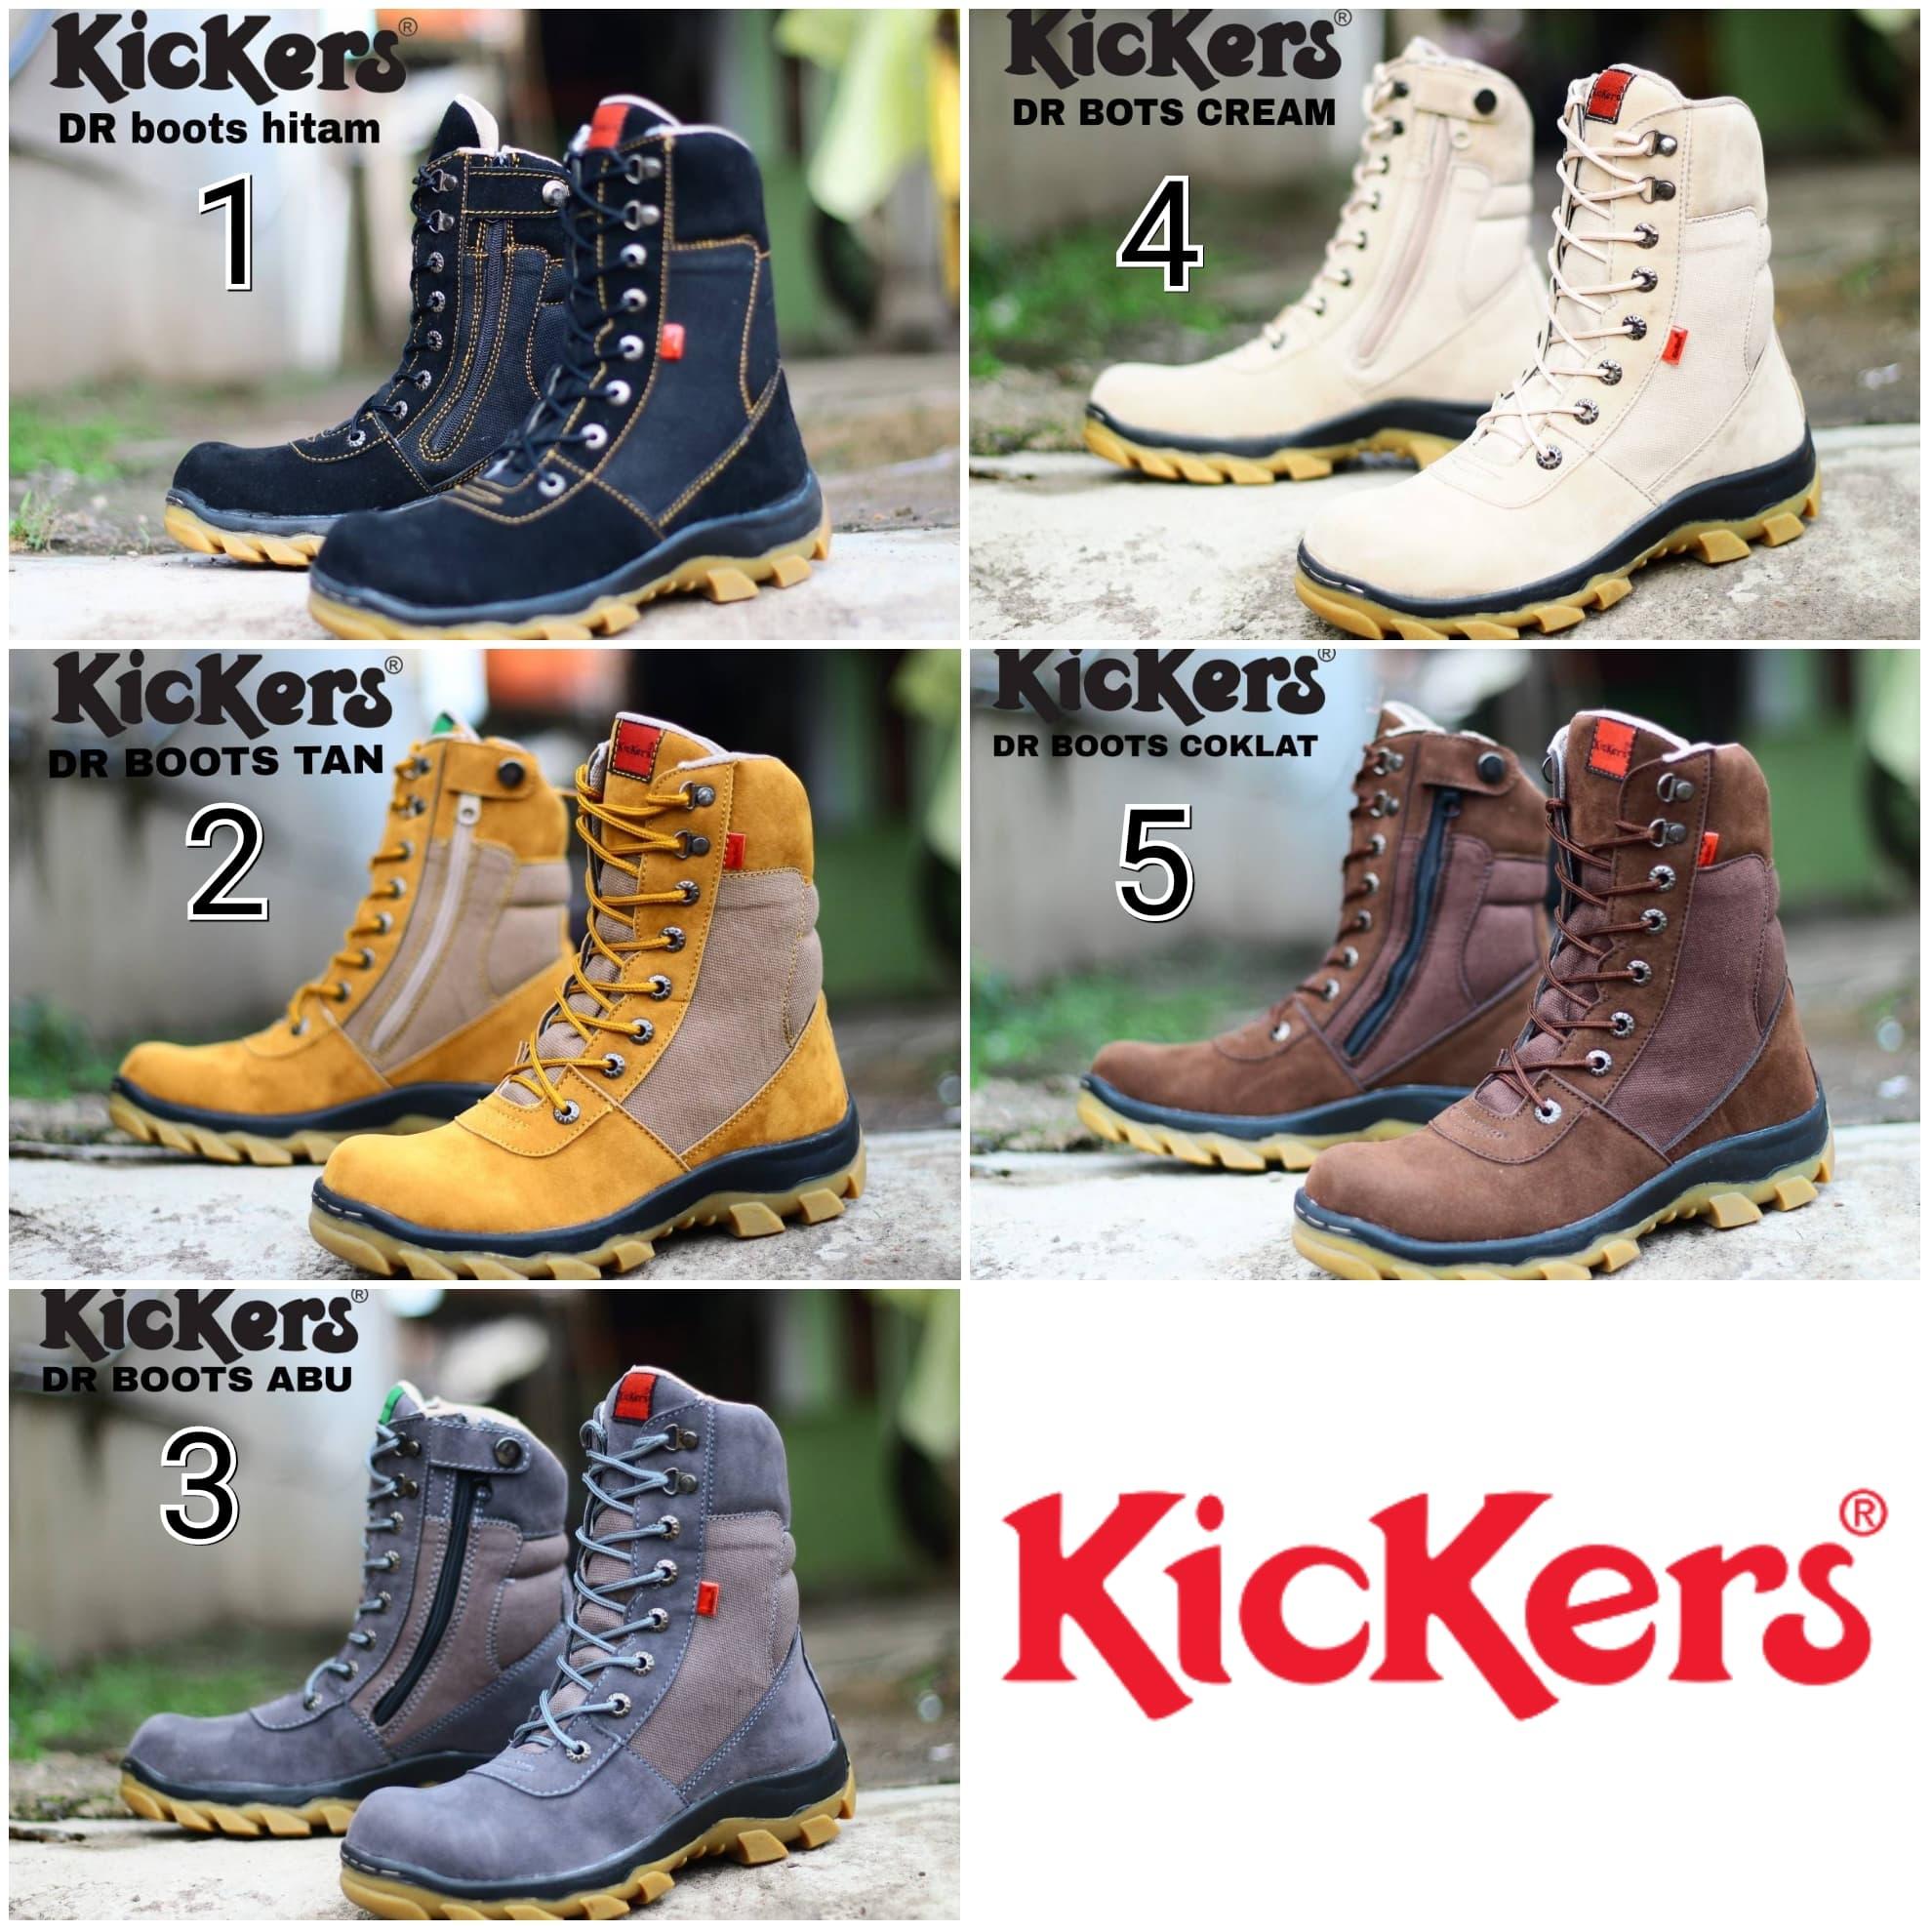 PENAWARAN Sepatu Kickers DR Boots Pria Safety Ujung Besi Kulit Suede  Tracking 71a2aea2b9